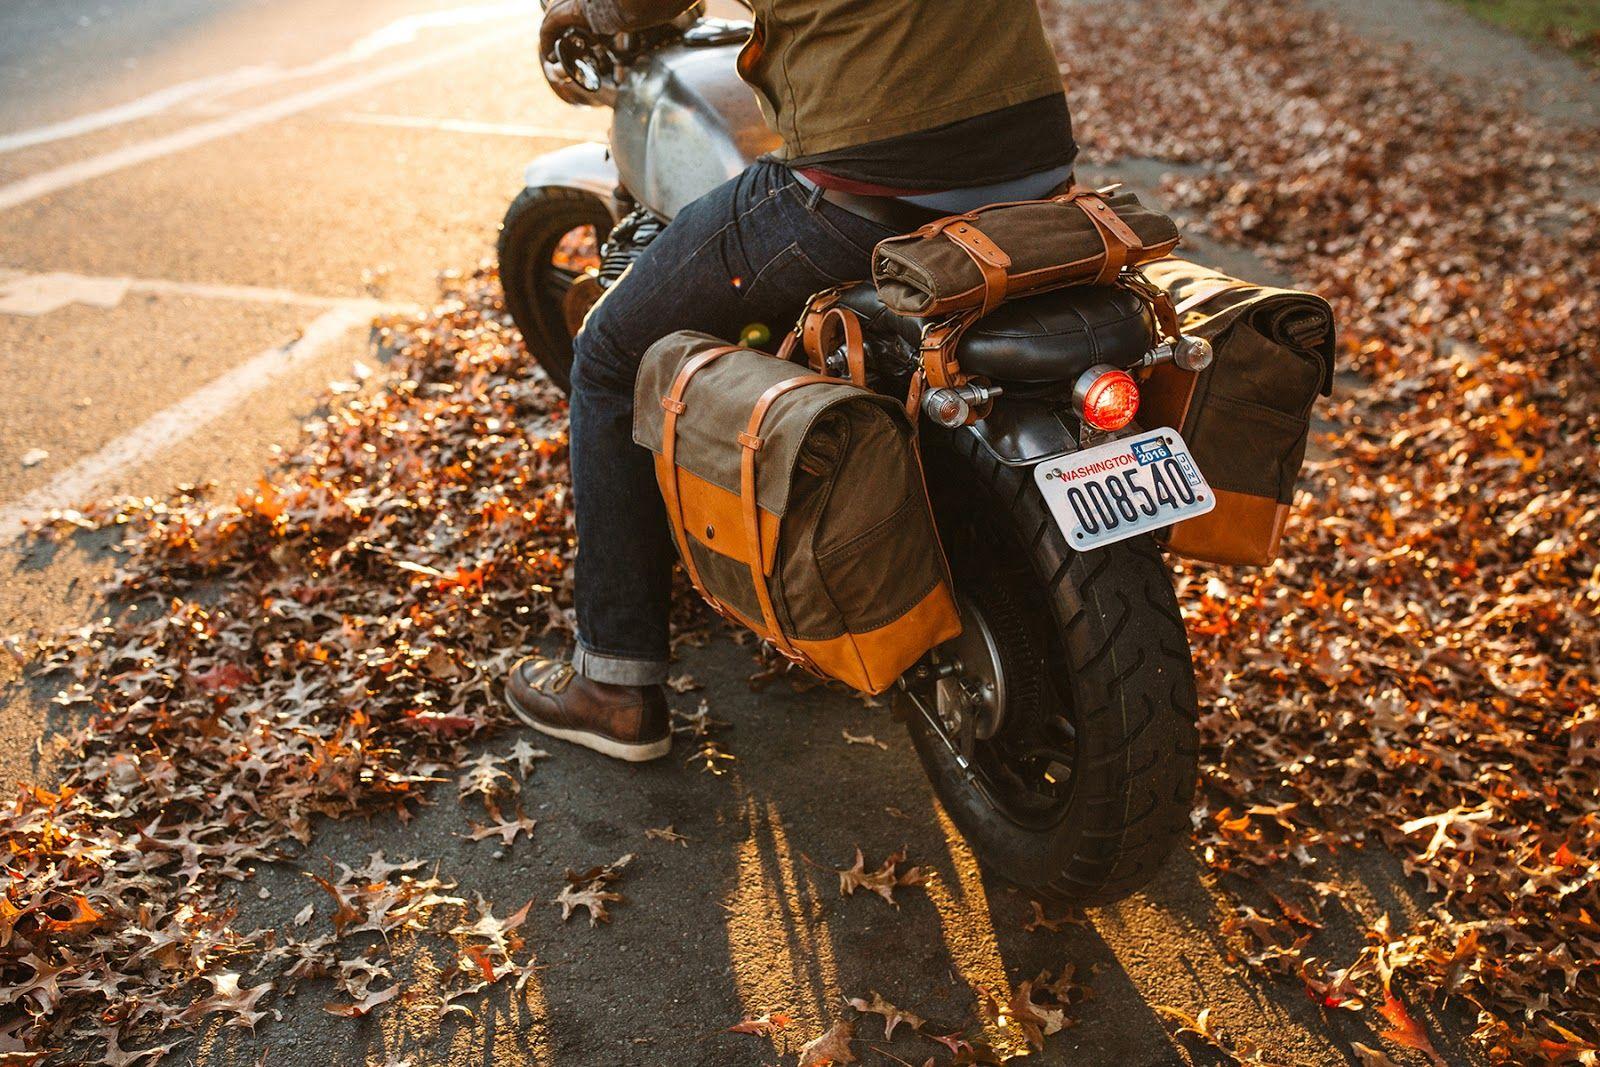 Gear Pack Animal Motorcycle Saddle Bags Motorrad Camping Satteltasche Motorrad